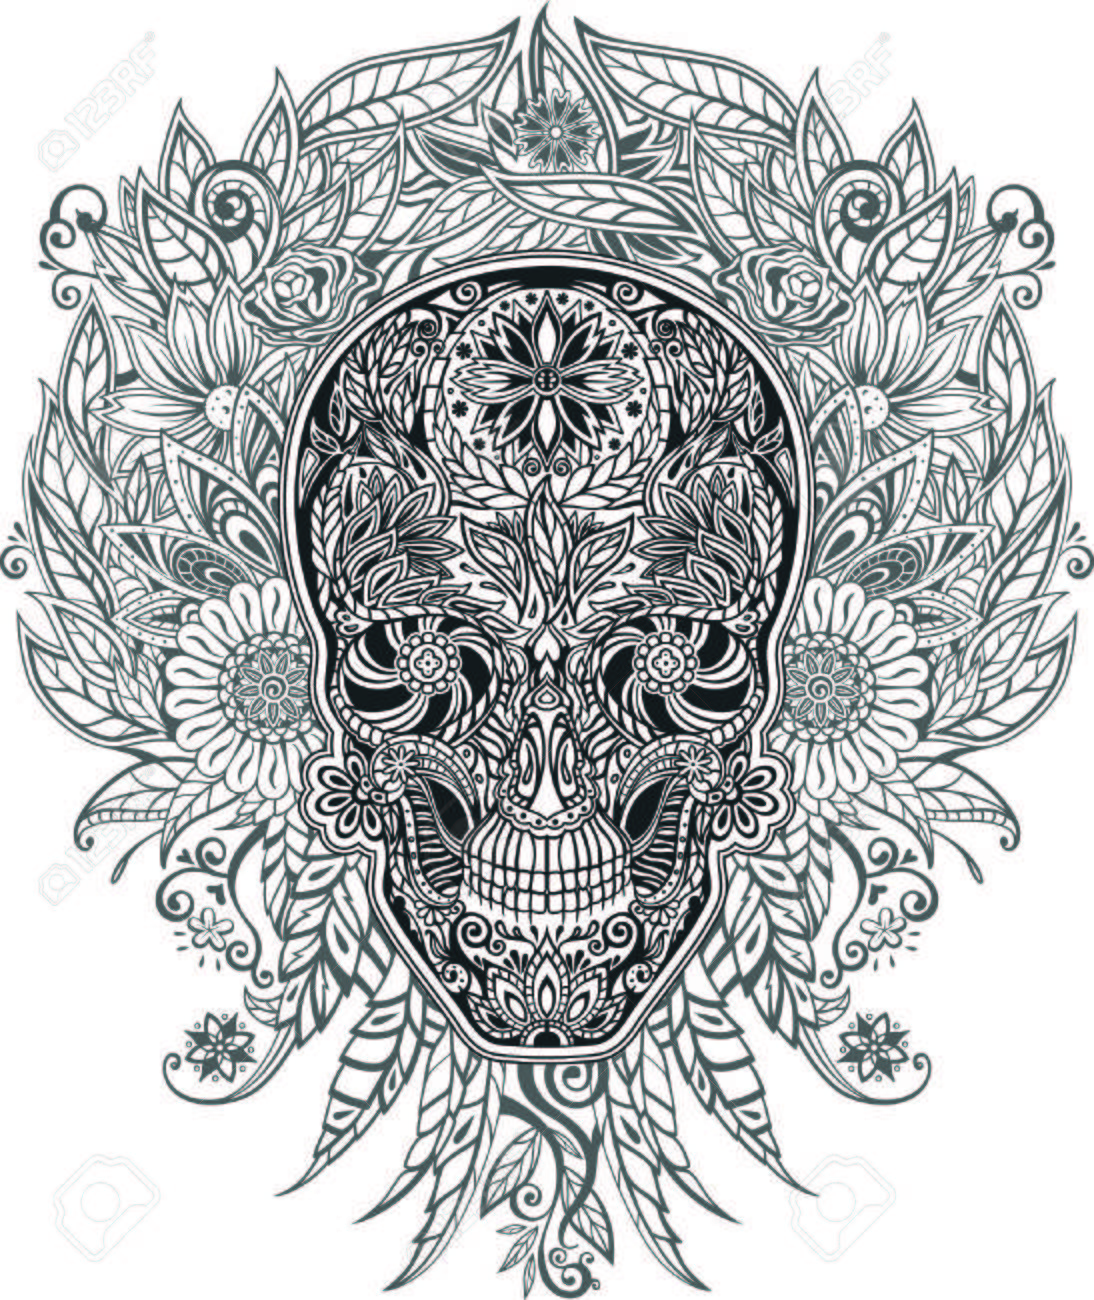 human skull made of flowers, vector illustration Stock Vector - 32961016